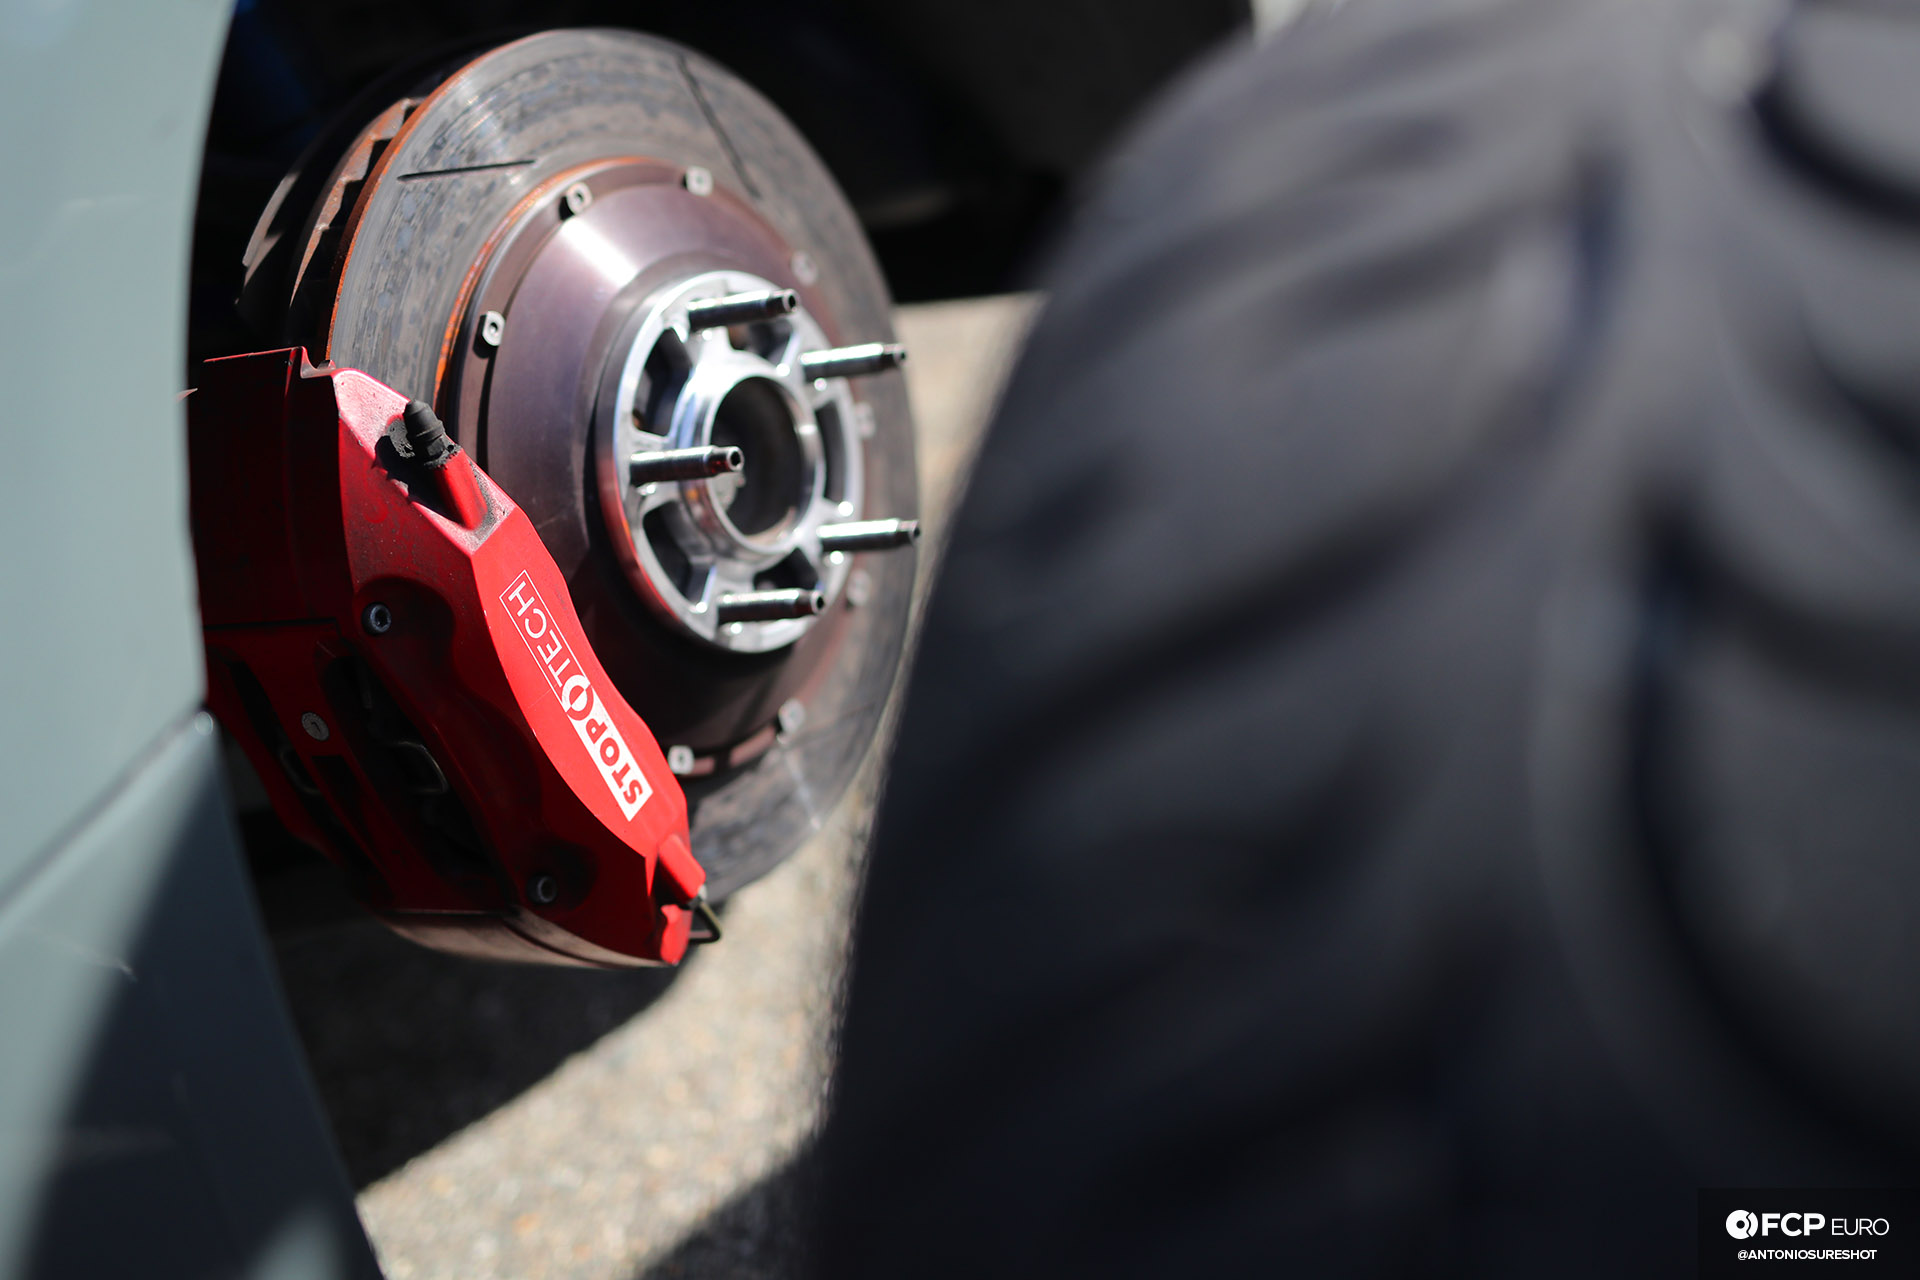 Bimmer Challenge BMW E92 M3 StopTech Brakes